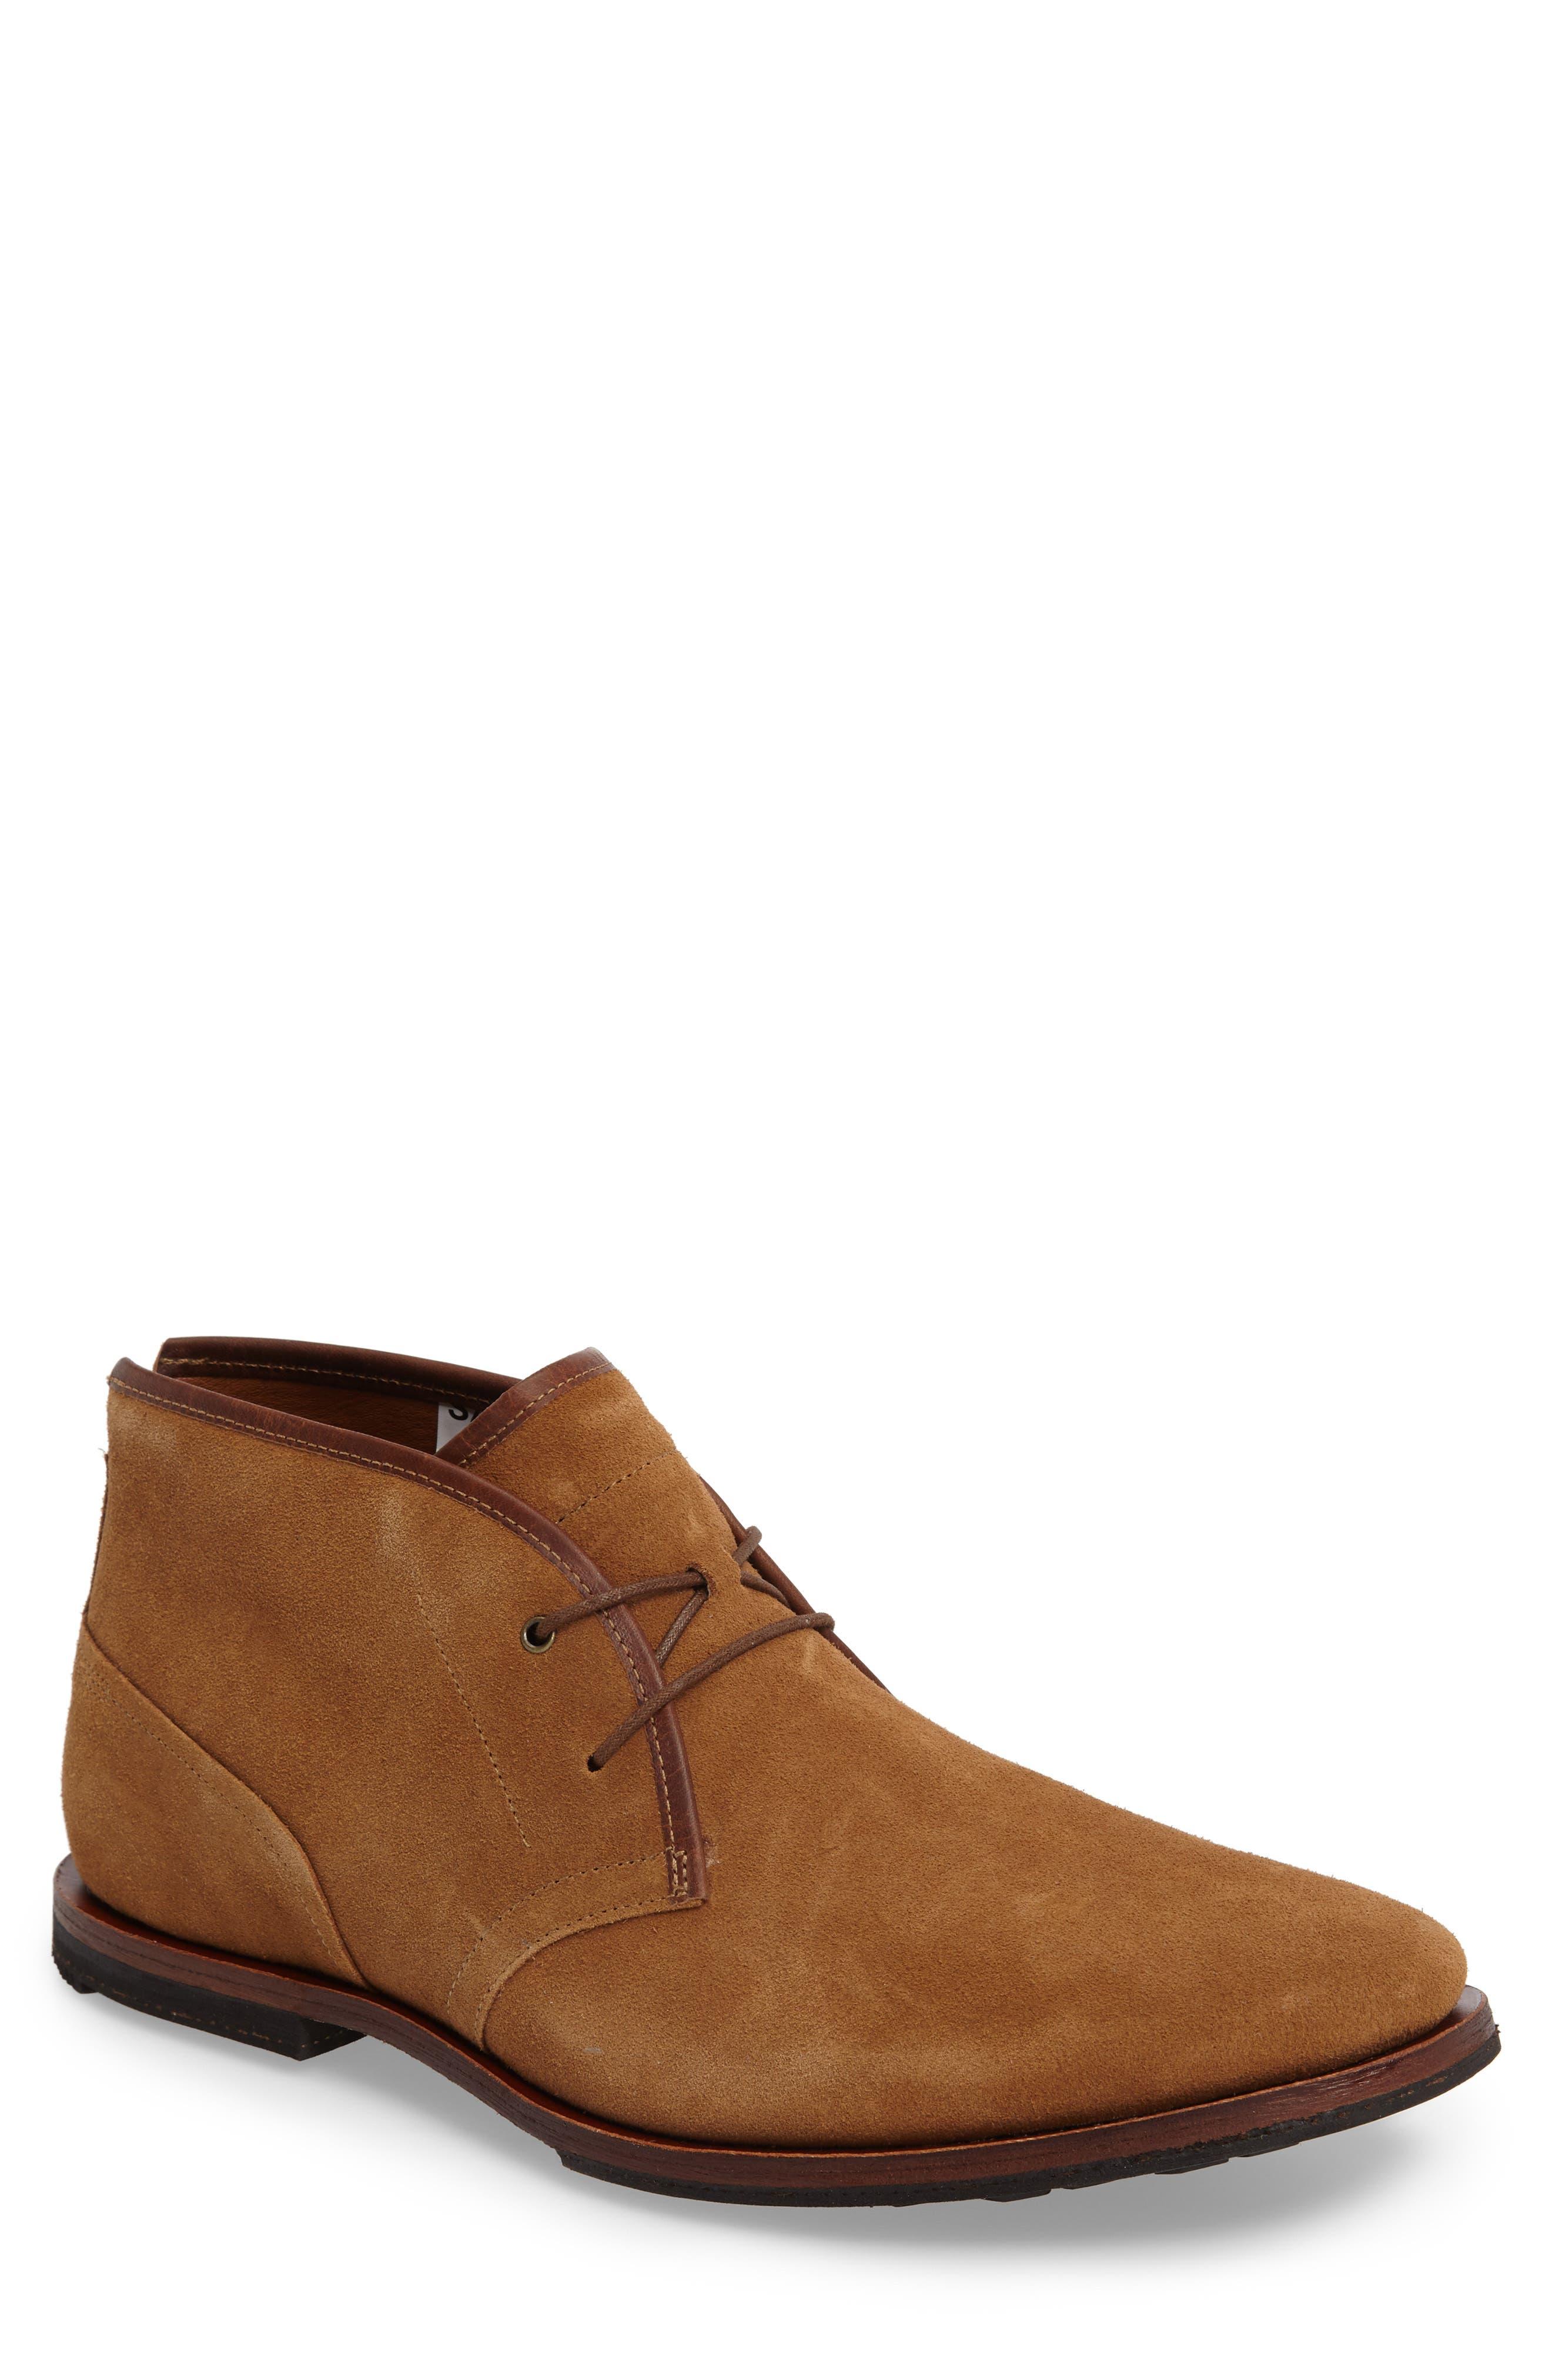 Main Image - Timberland Wodehouse Lost History Boot (Men)